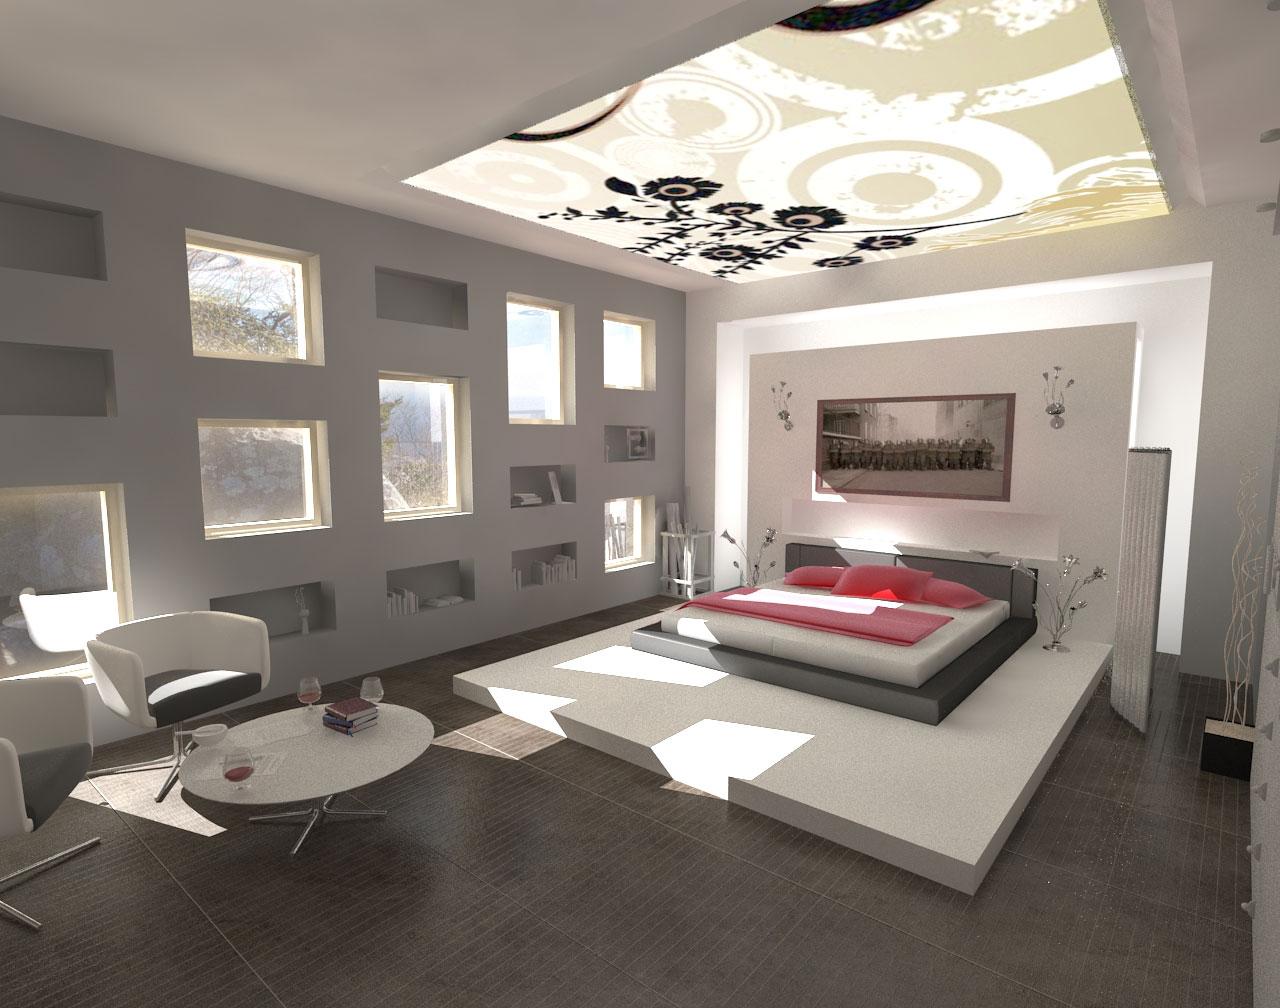 http://2.bp.blogspot.com/-RH7CxfyTFnI/Tk-rJyEpe5I/AAAAAAAAEmU/xPMU3t0NDAg/s1600/contemporary-luxury-master-bedroom.jpg